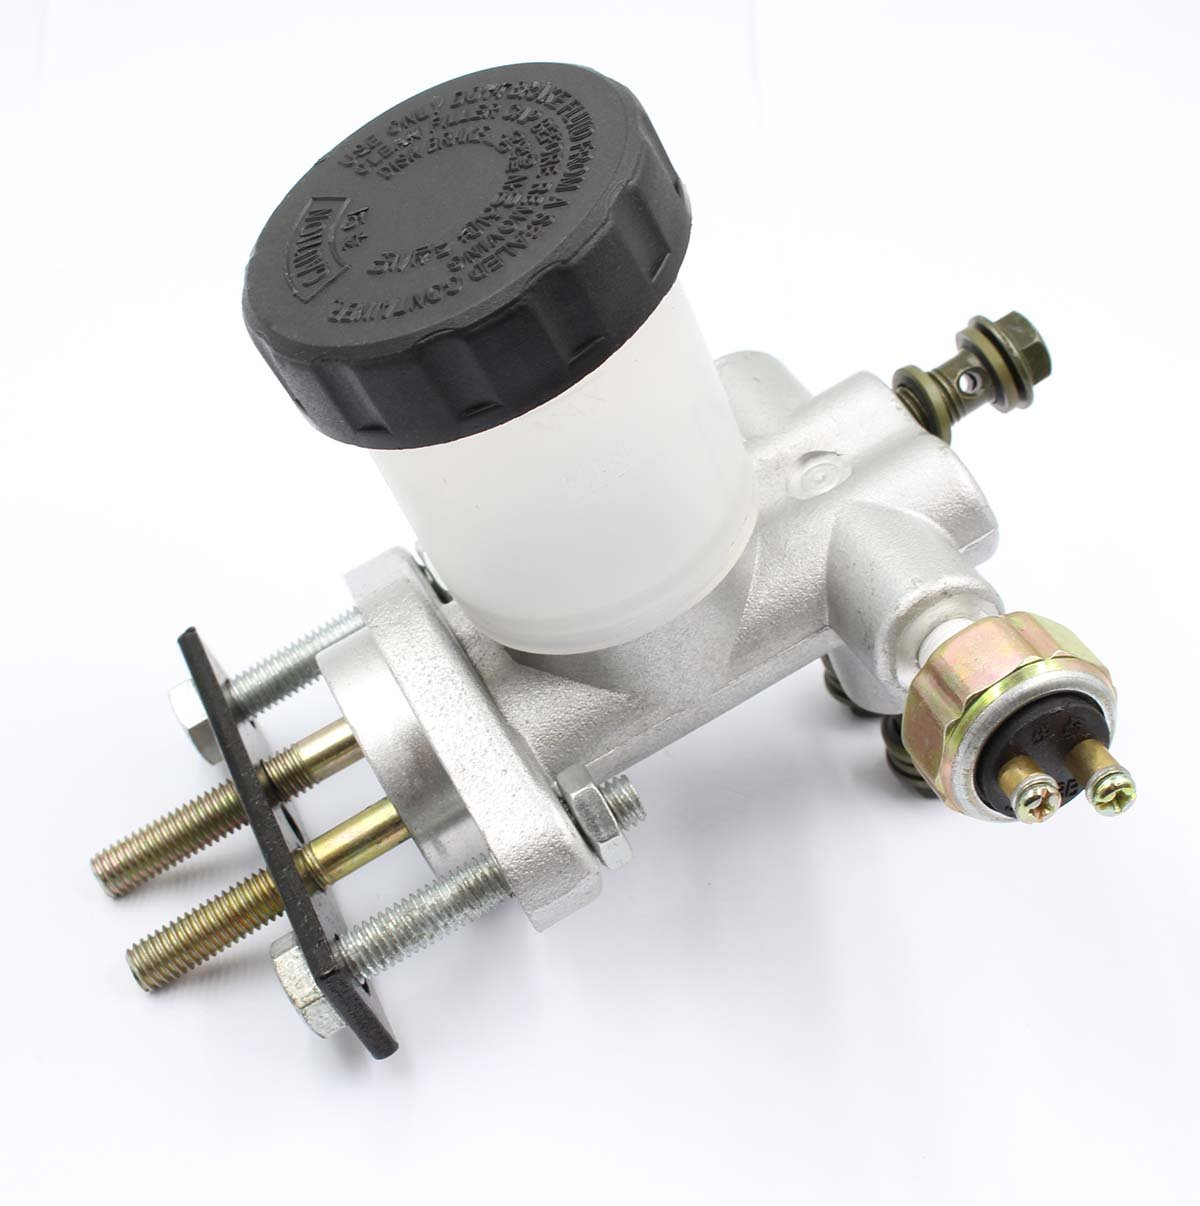 GooDeal Hydraulic Brake Master Cylinder for Go Kart Buggy 90cc 110cc 125cc 150cc 200cc 250cc by GooDeal